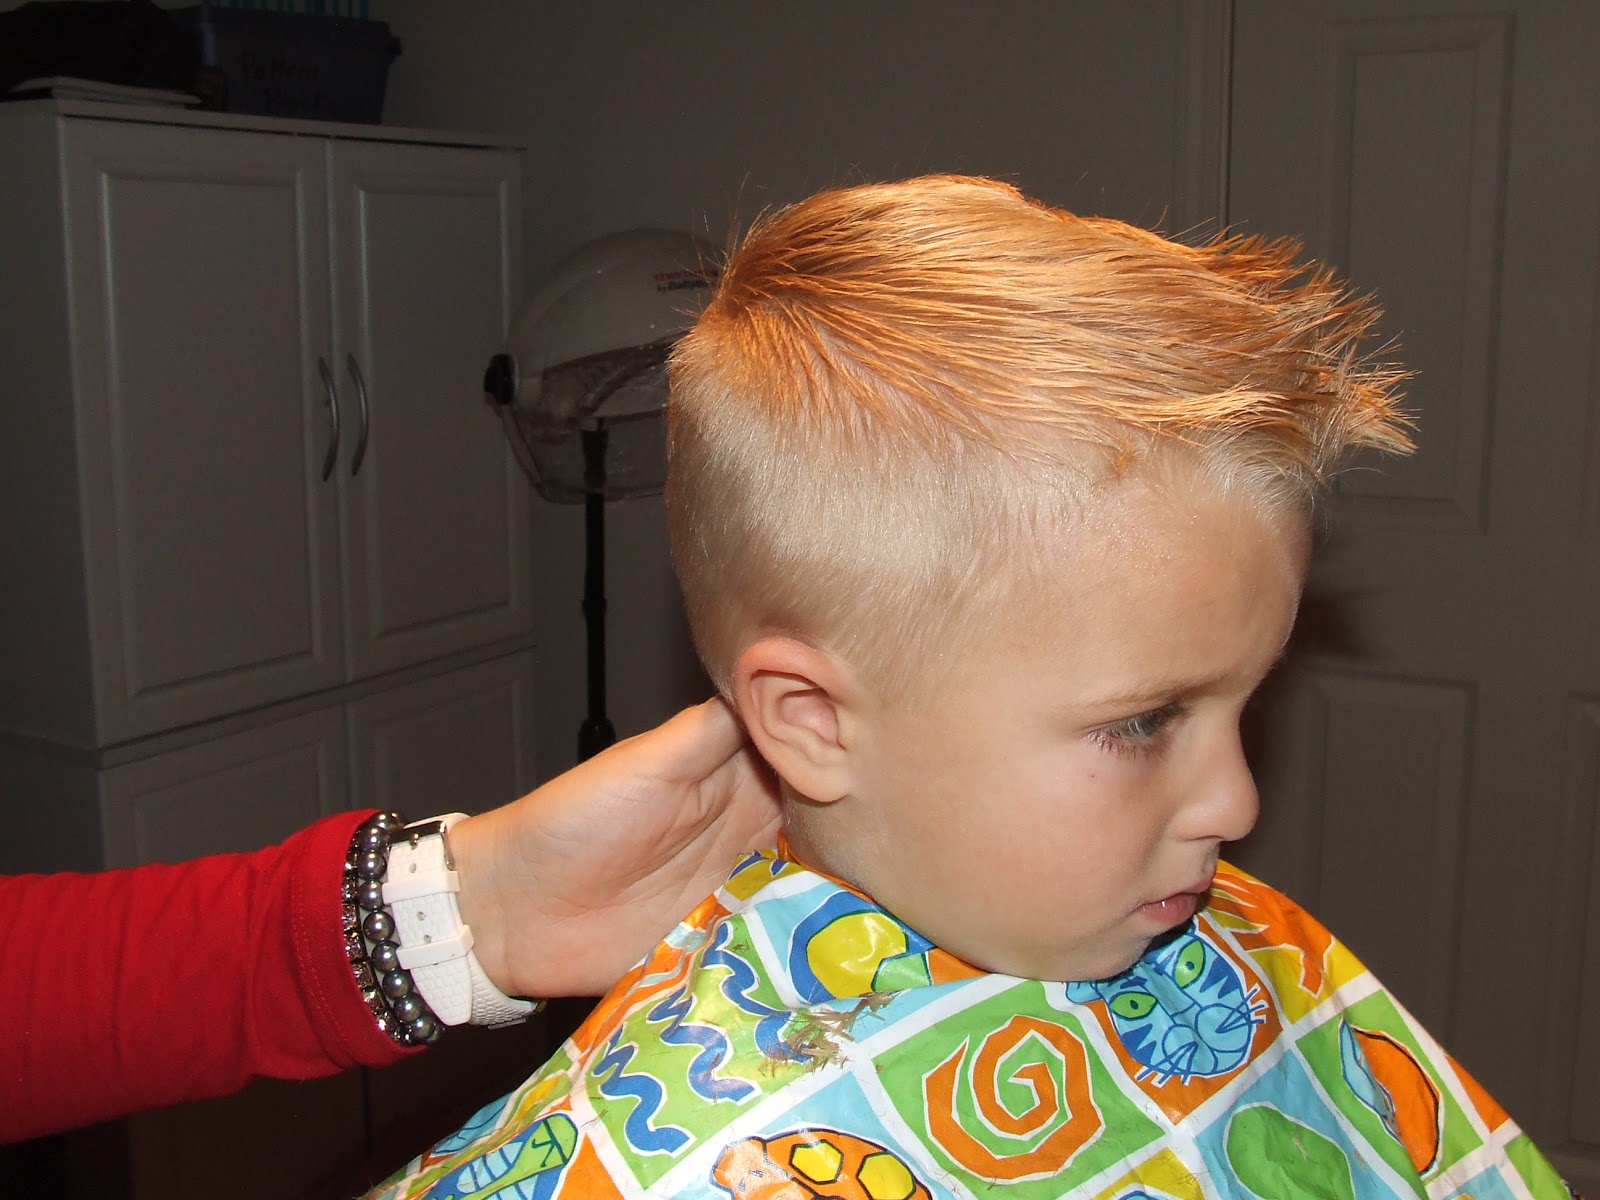 boy hair cutting games 2012